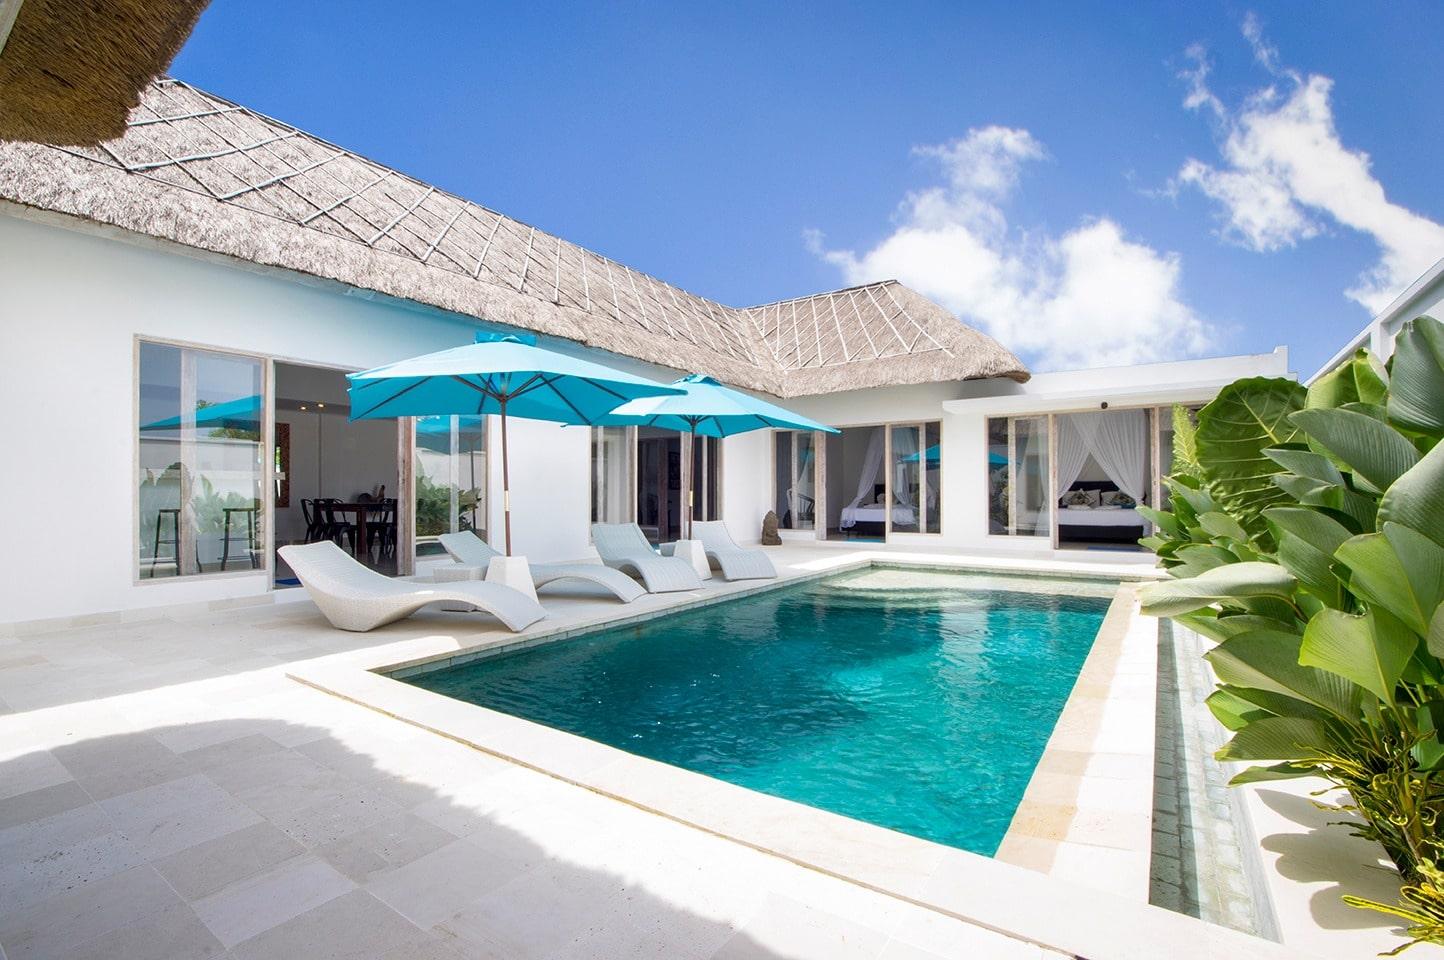 Location de villa pas ch re bali 4 chambres et une - Villa piscine privee ...